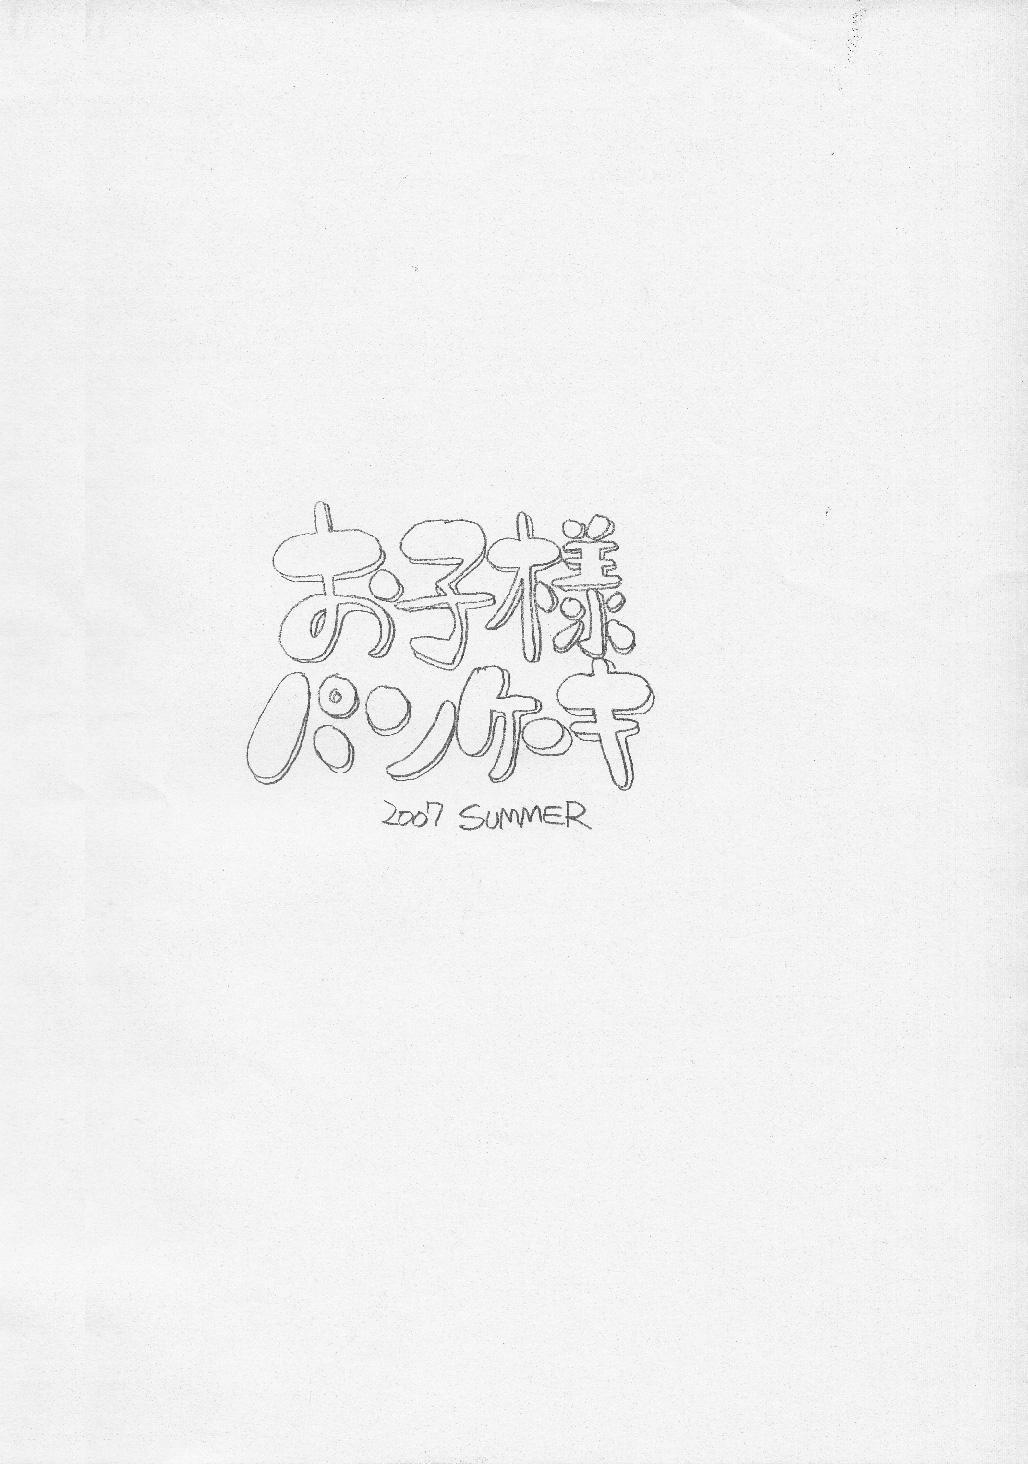 [ Okosama Pankeki (Arurukaana 7A)]Gekkan oko pan 2007-nen 8 tsuki-gō (Ojamajo Doremi) 13